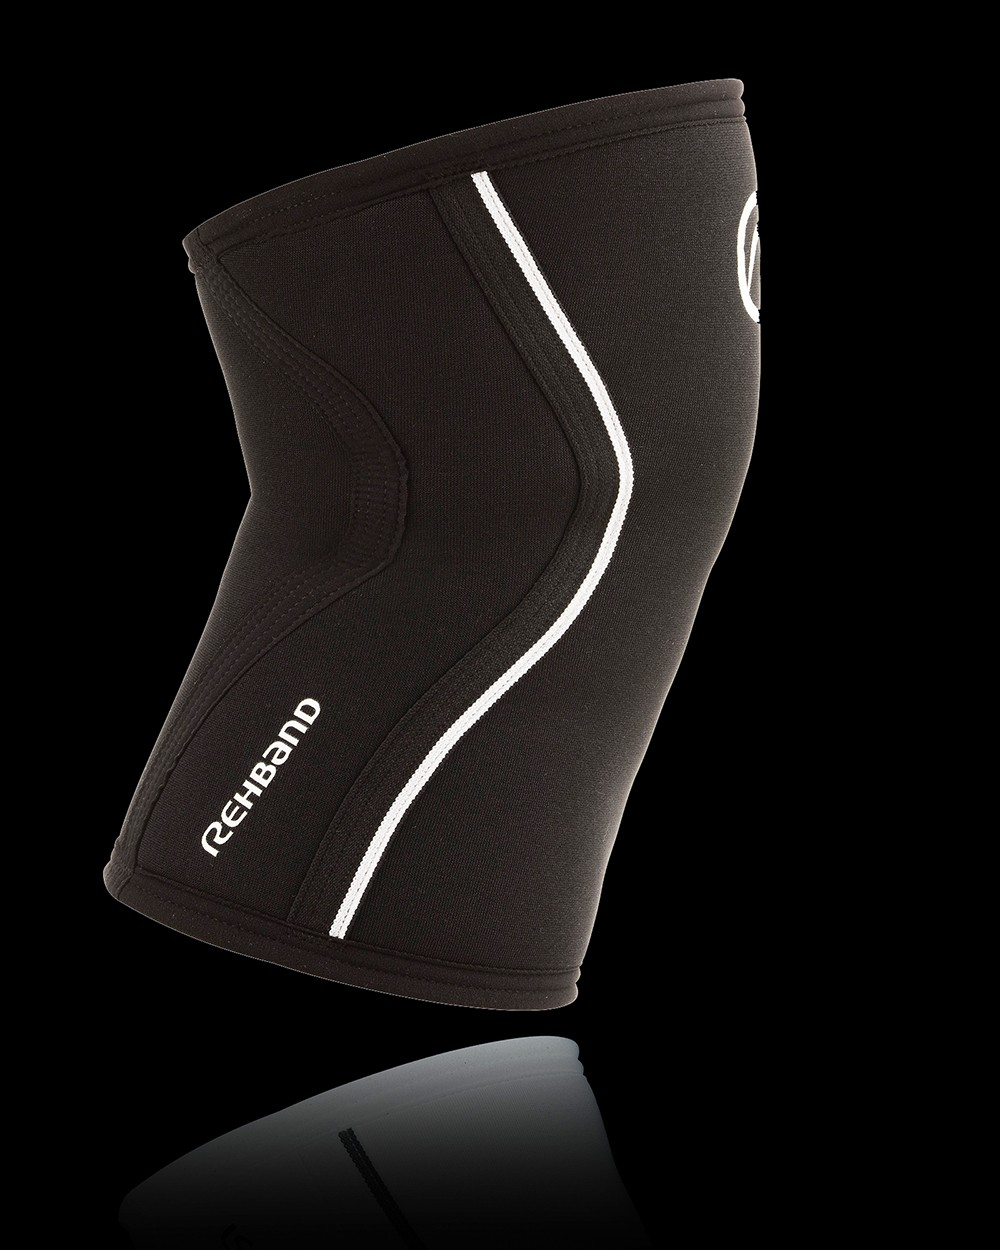 Rehband RX Kniebandage schwarz 7mm